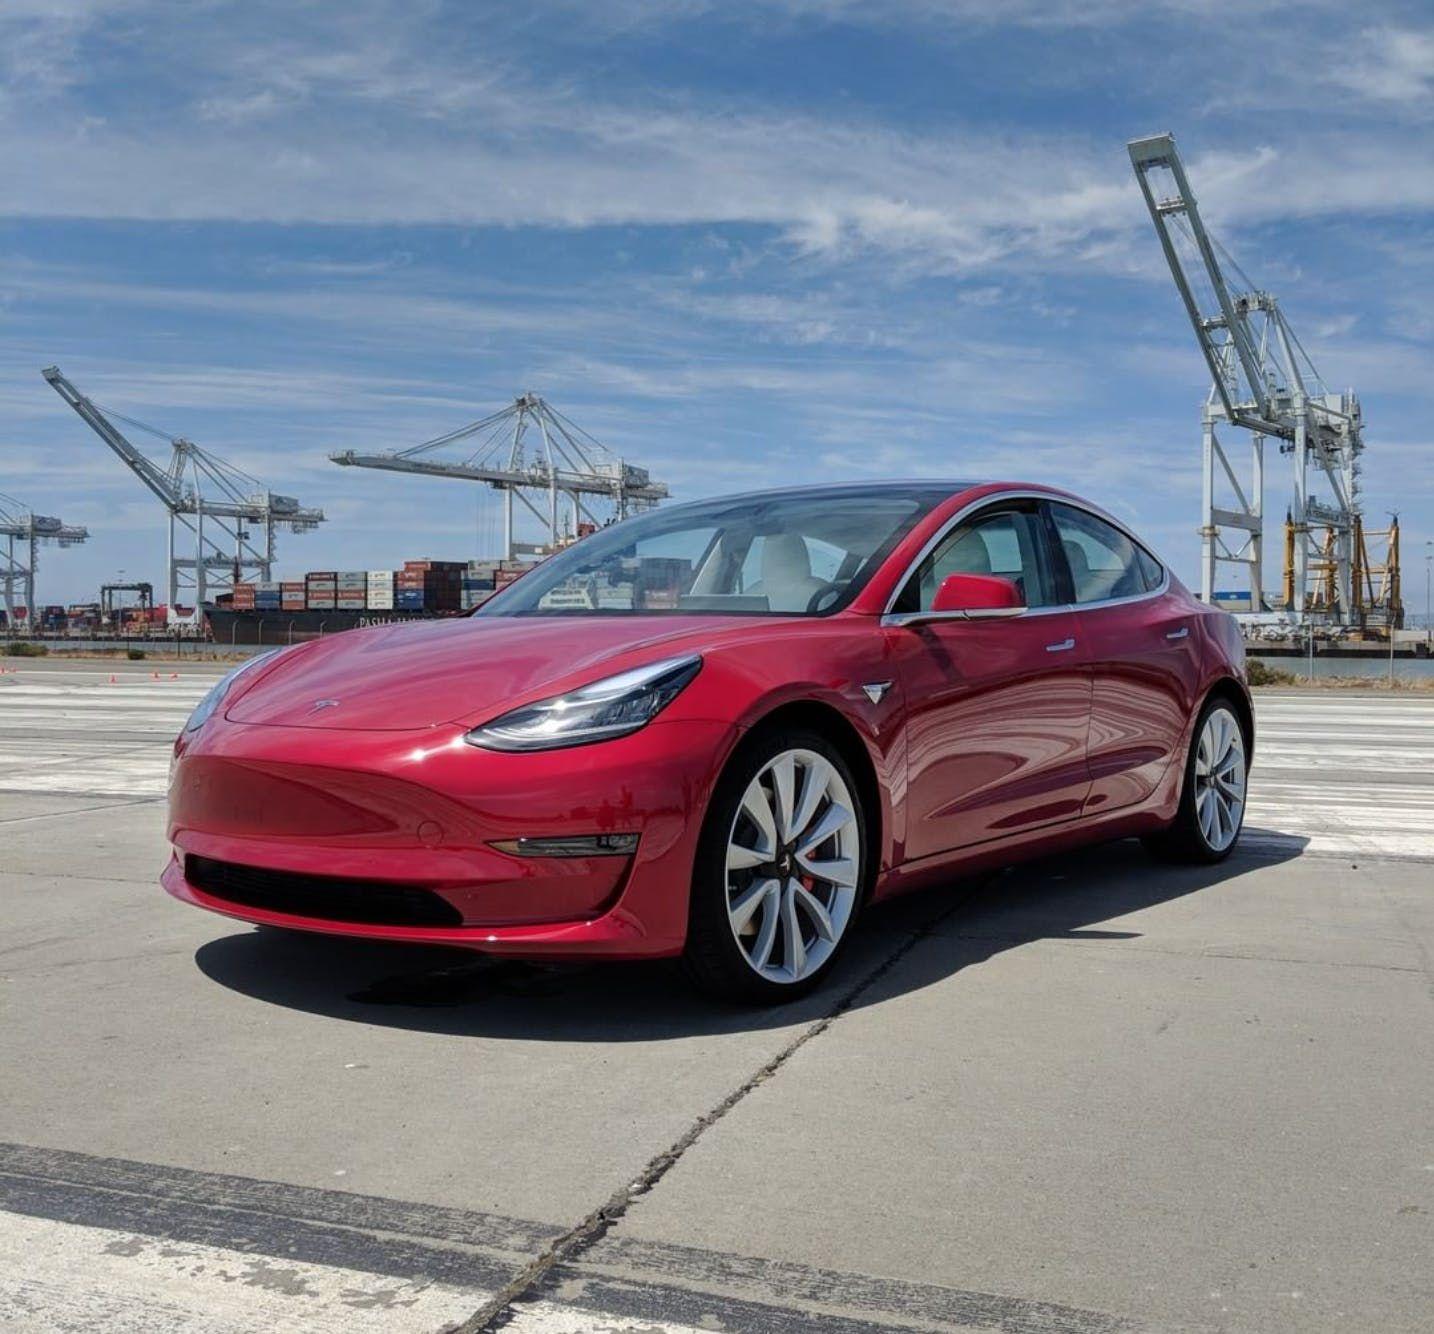 Tesla Autopilot V9 Brings Big Boosts To Model 3 S Autonomous Features Tesla Unbox Therapy Bring It On